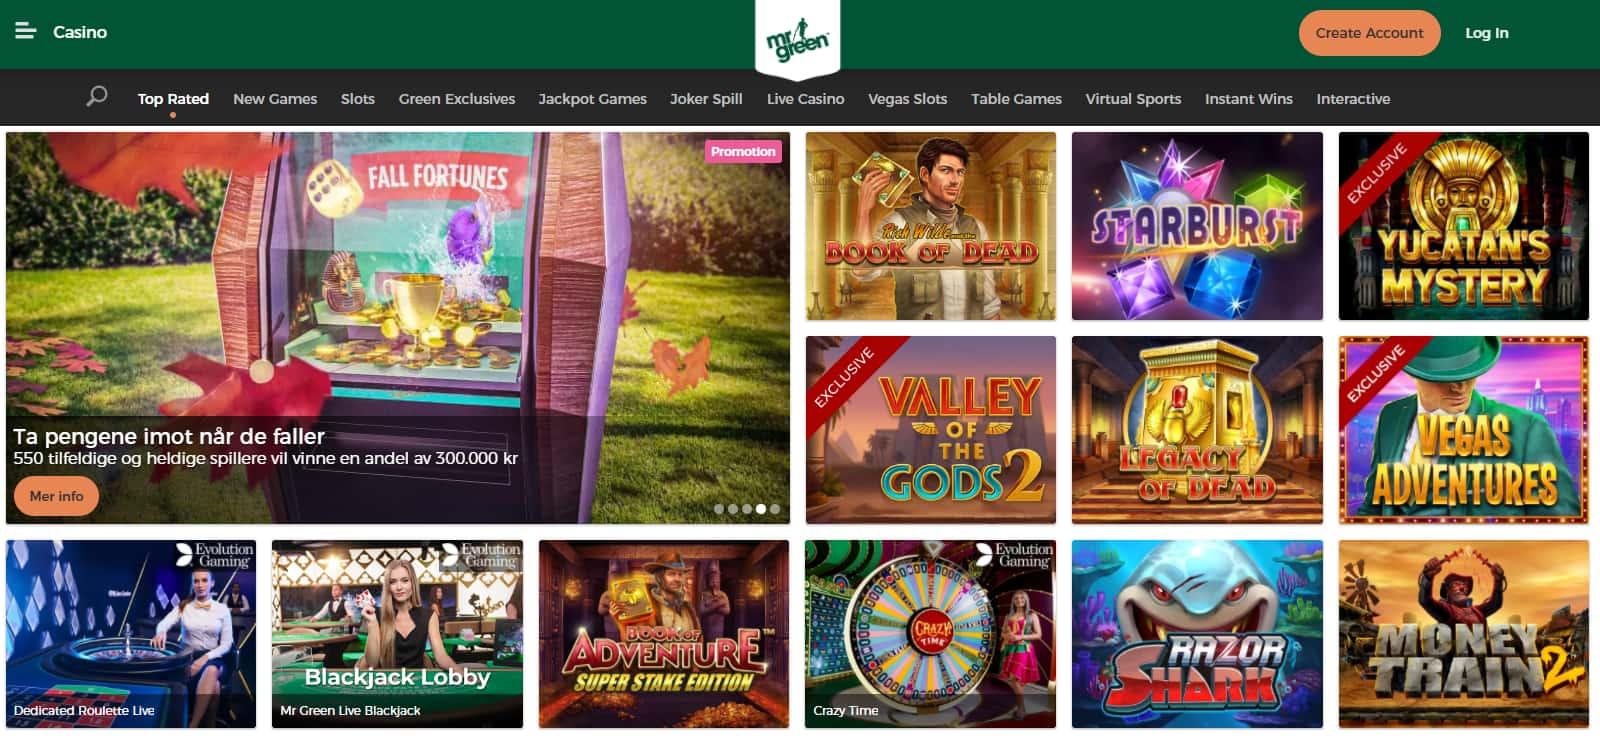 Mr Green Casino Promotions